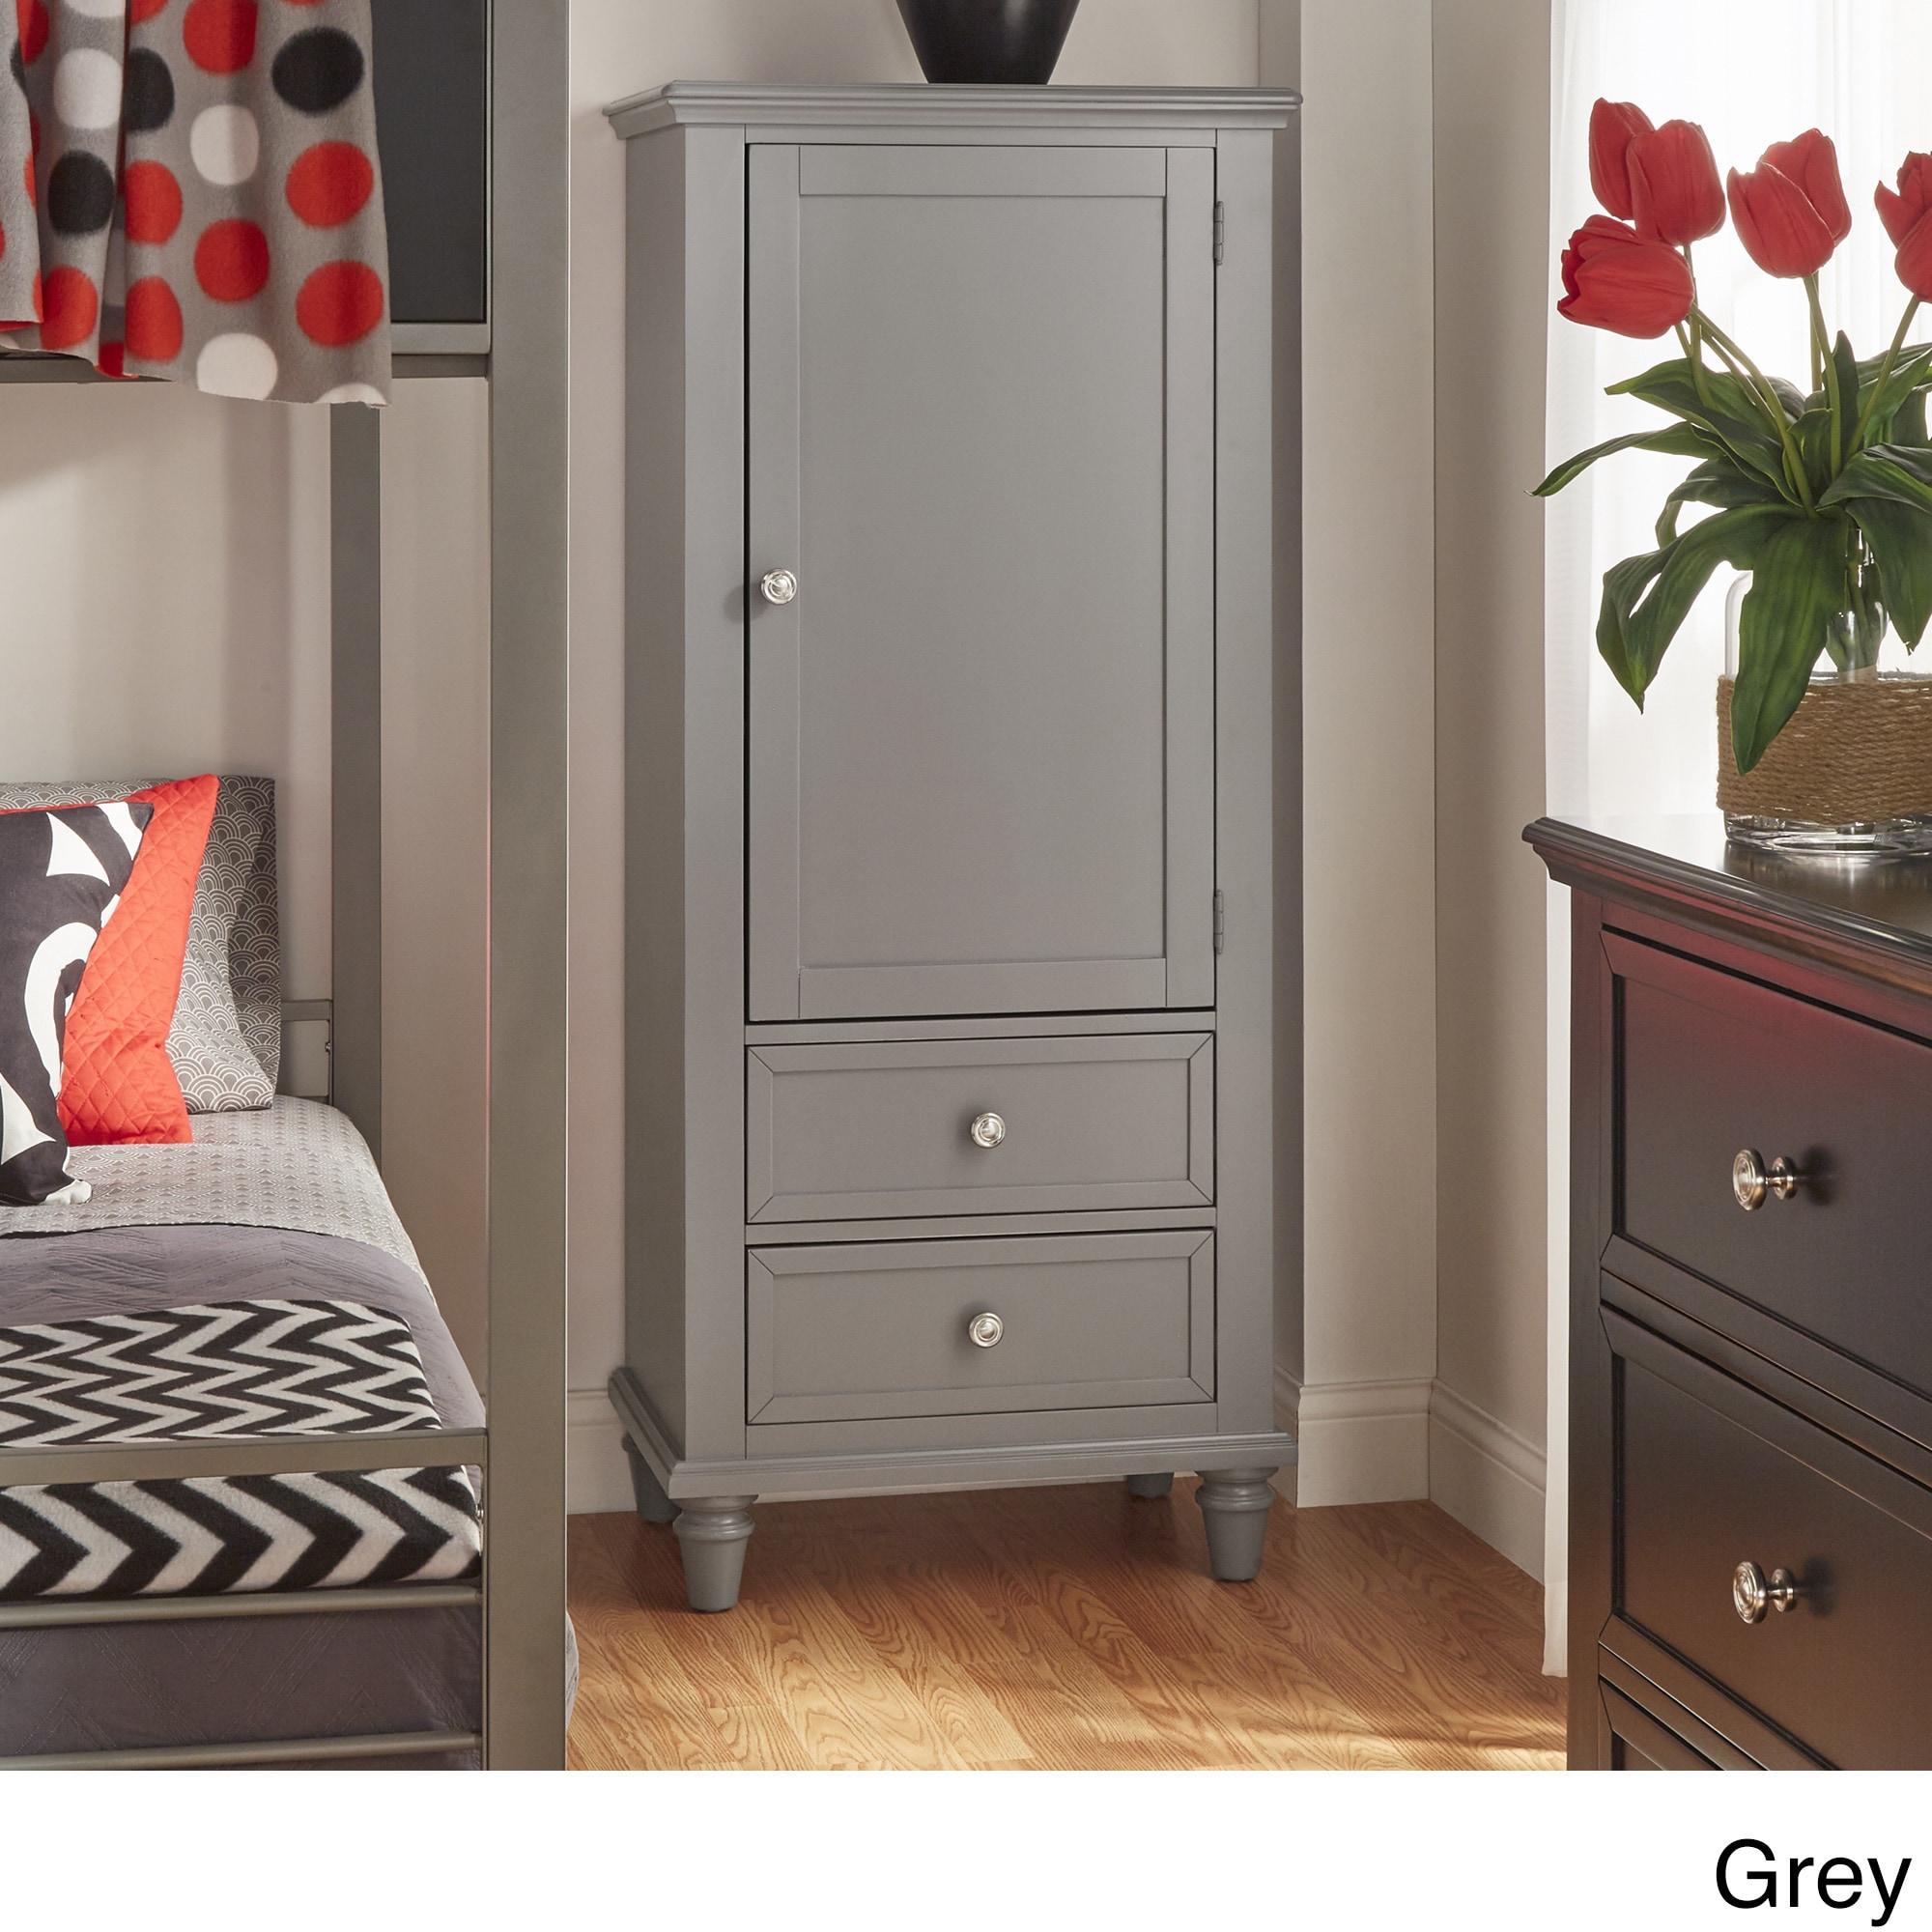 Preston Wooden Wardrobe Storage Armoire by iNSPIRE Q Junior - Free Shipping  Today - Overstock.com - 18687883